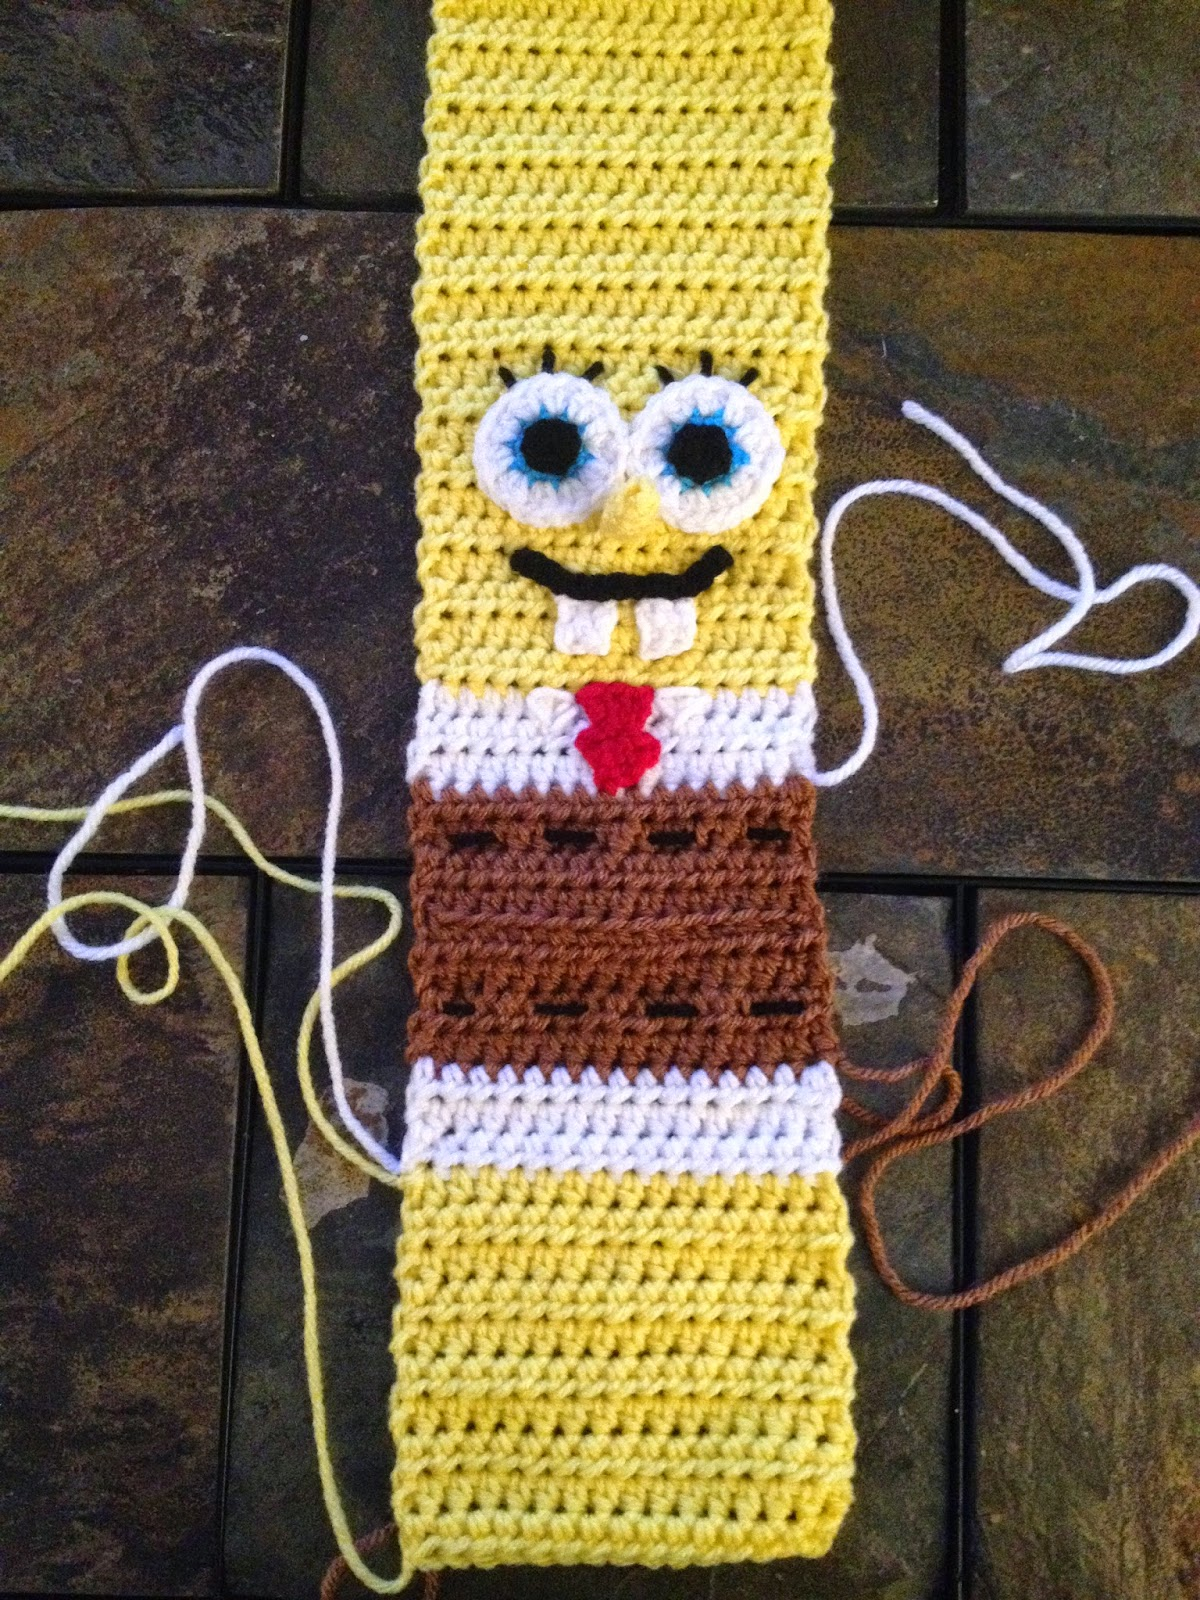 By Jenni Designs: Free Crochet Pattern: Spongebob Squarepants Inspired Scarf